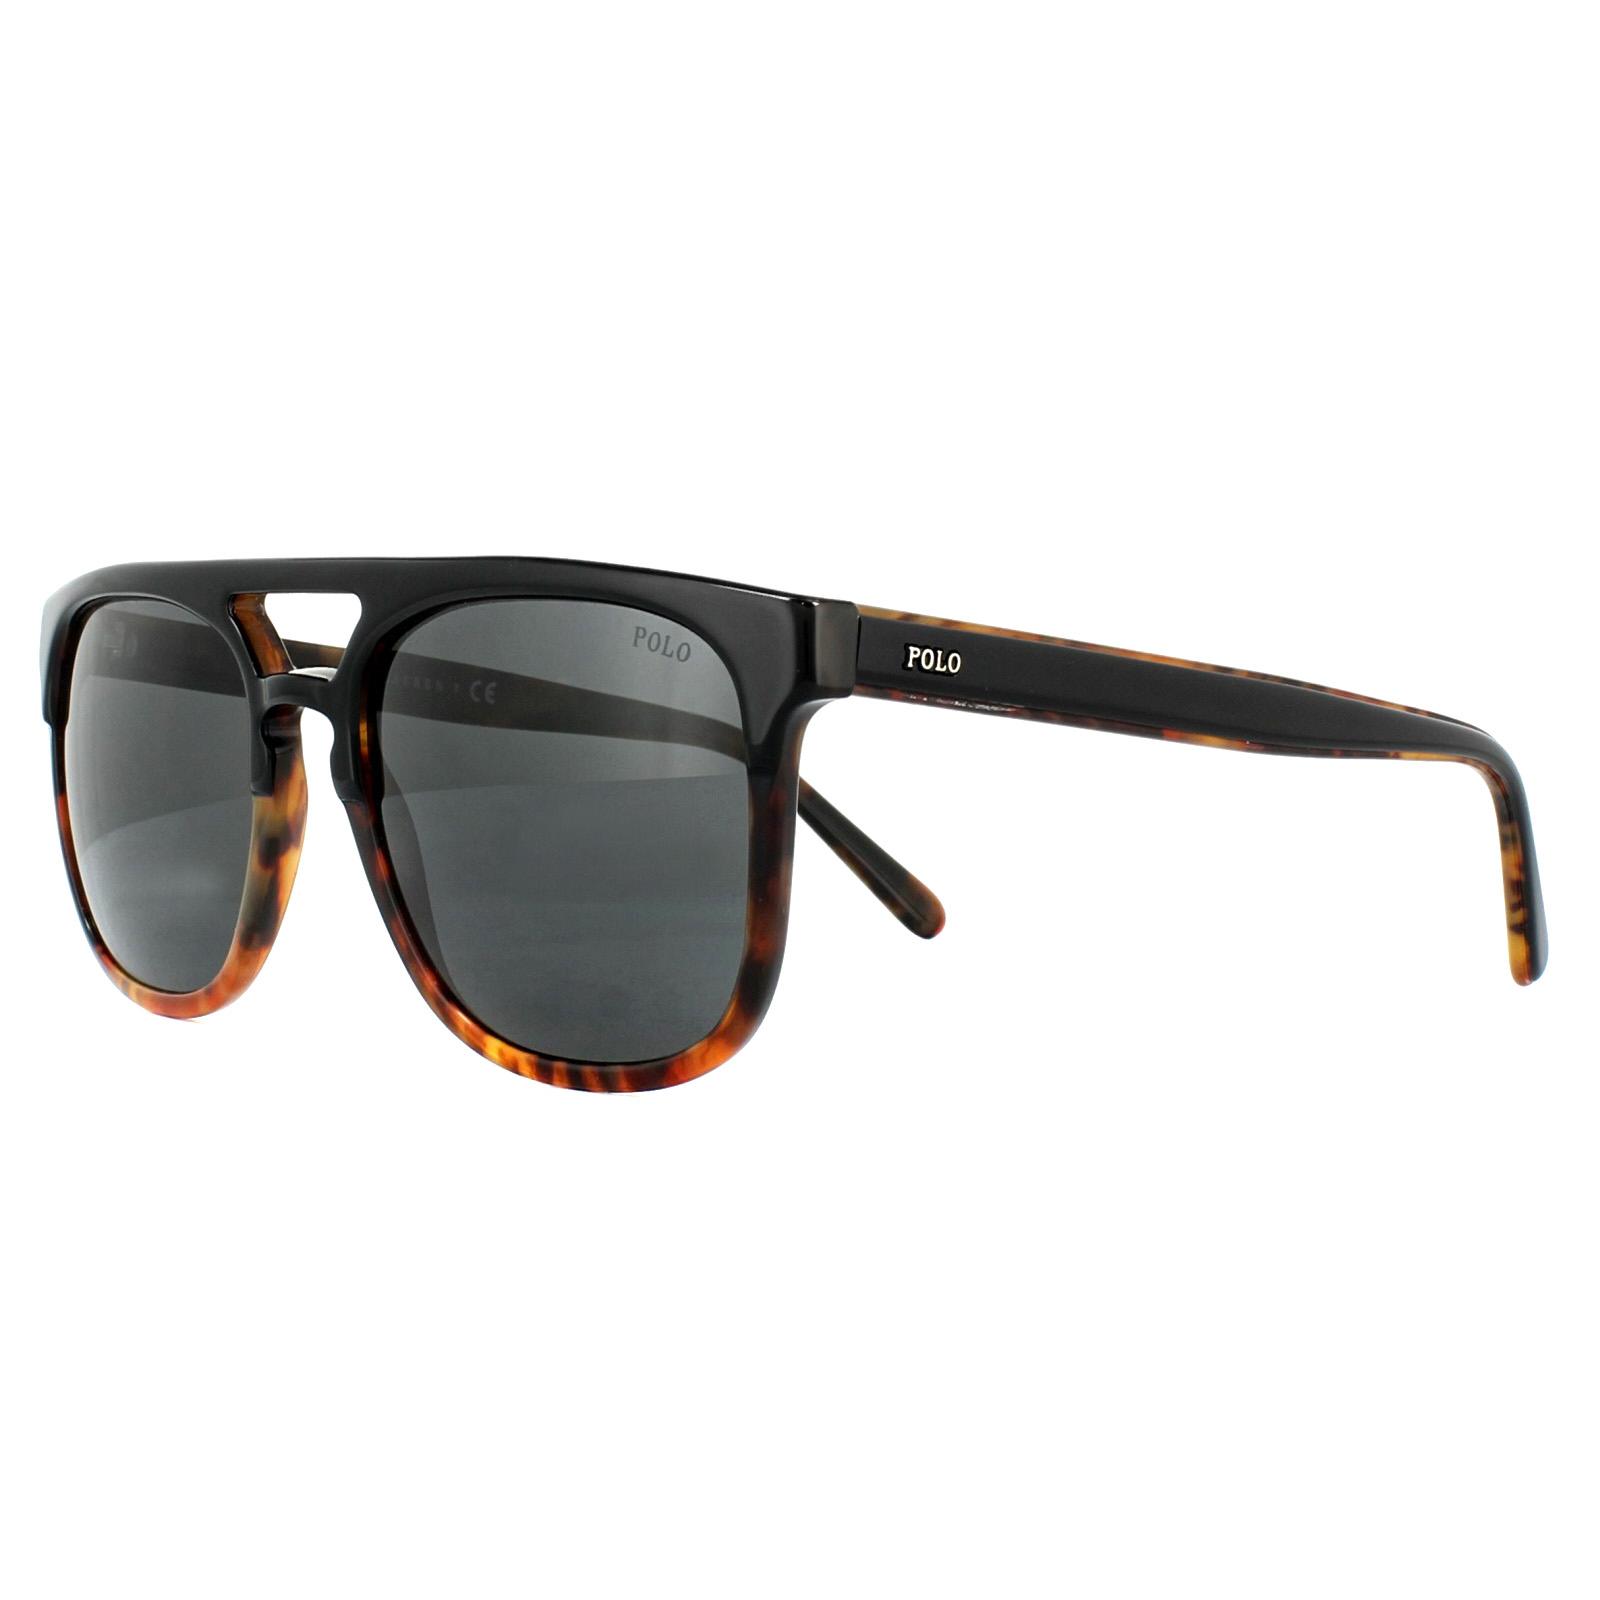 6f9eea7c49 Sentinel Polo Ralph Lauren Sunglasses PH4125 526087 Top Black on Jerry  Havana Dark Grey